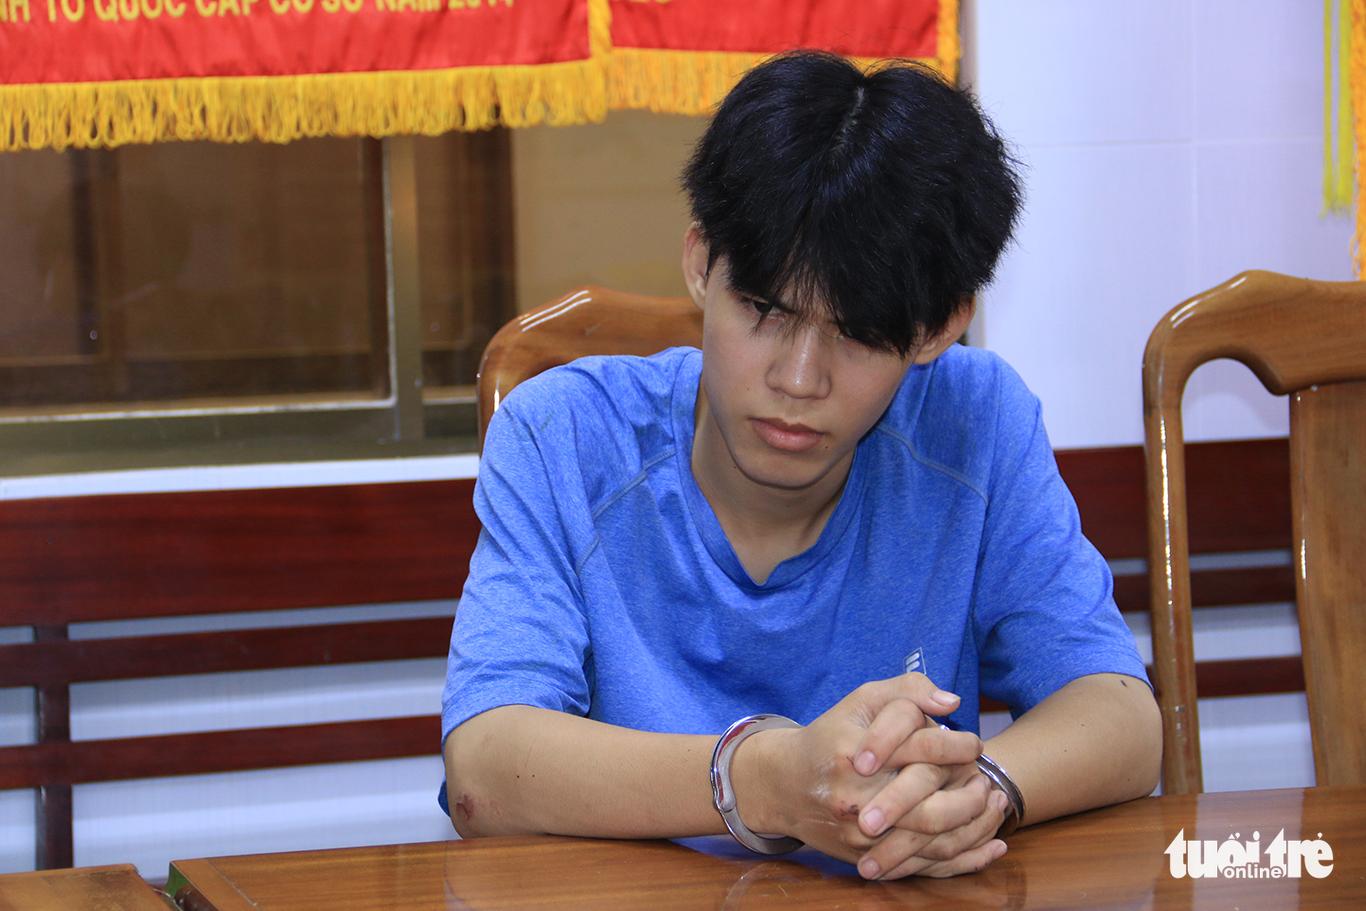 Teenage game addict murders, robs friend in Vietnam's Mekong Delta